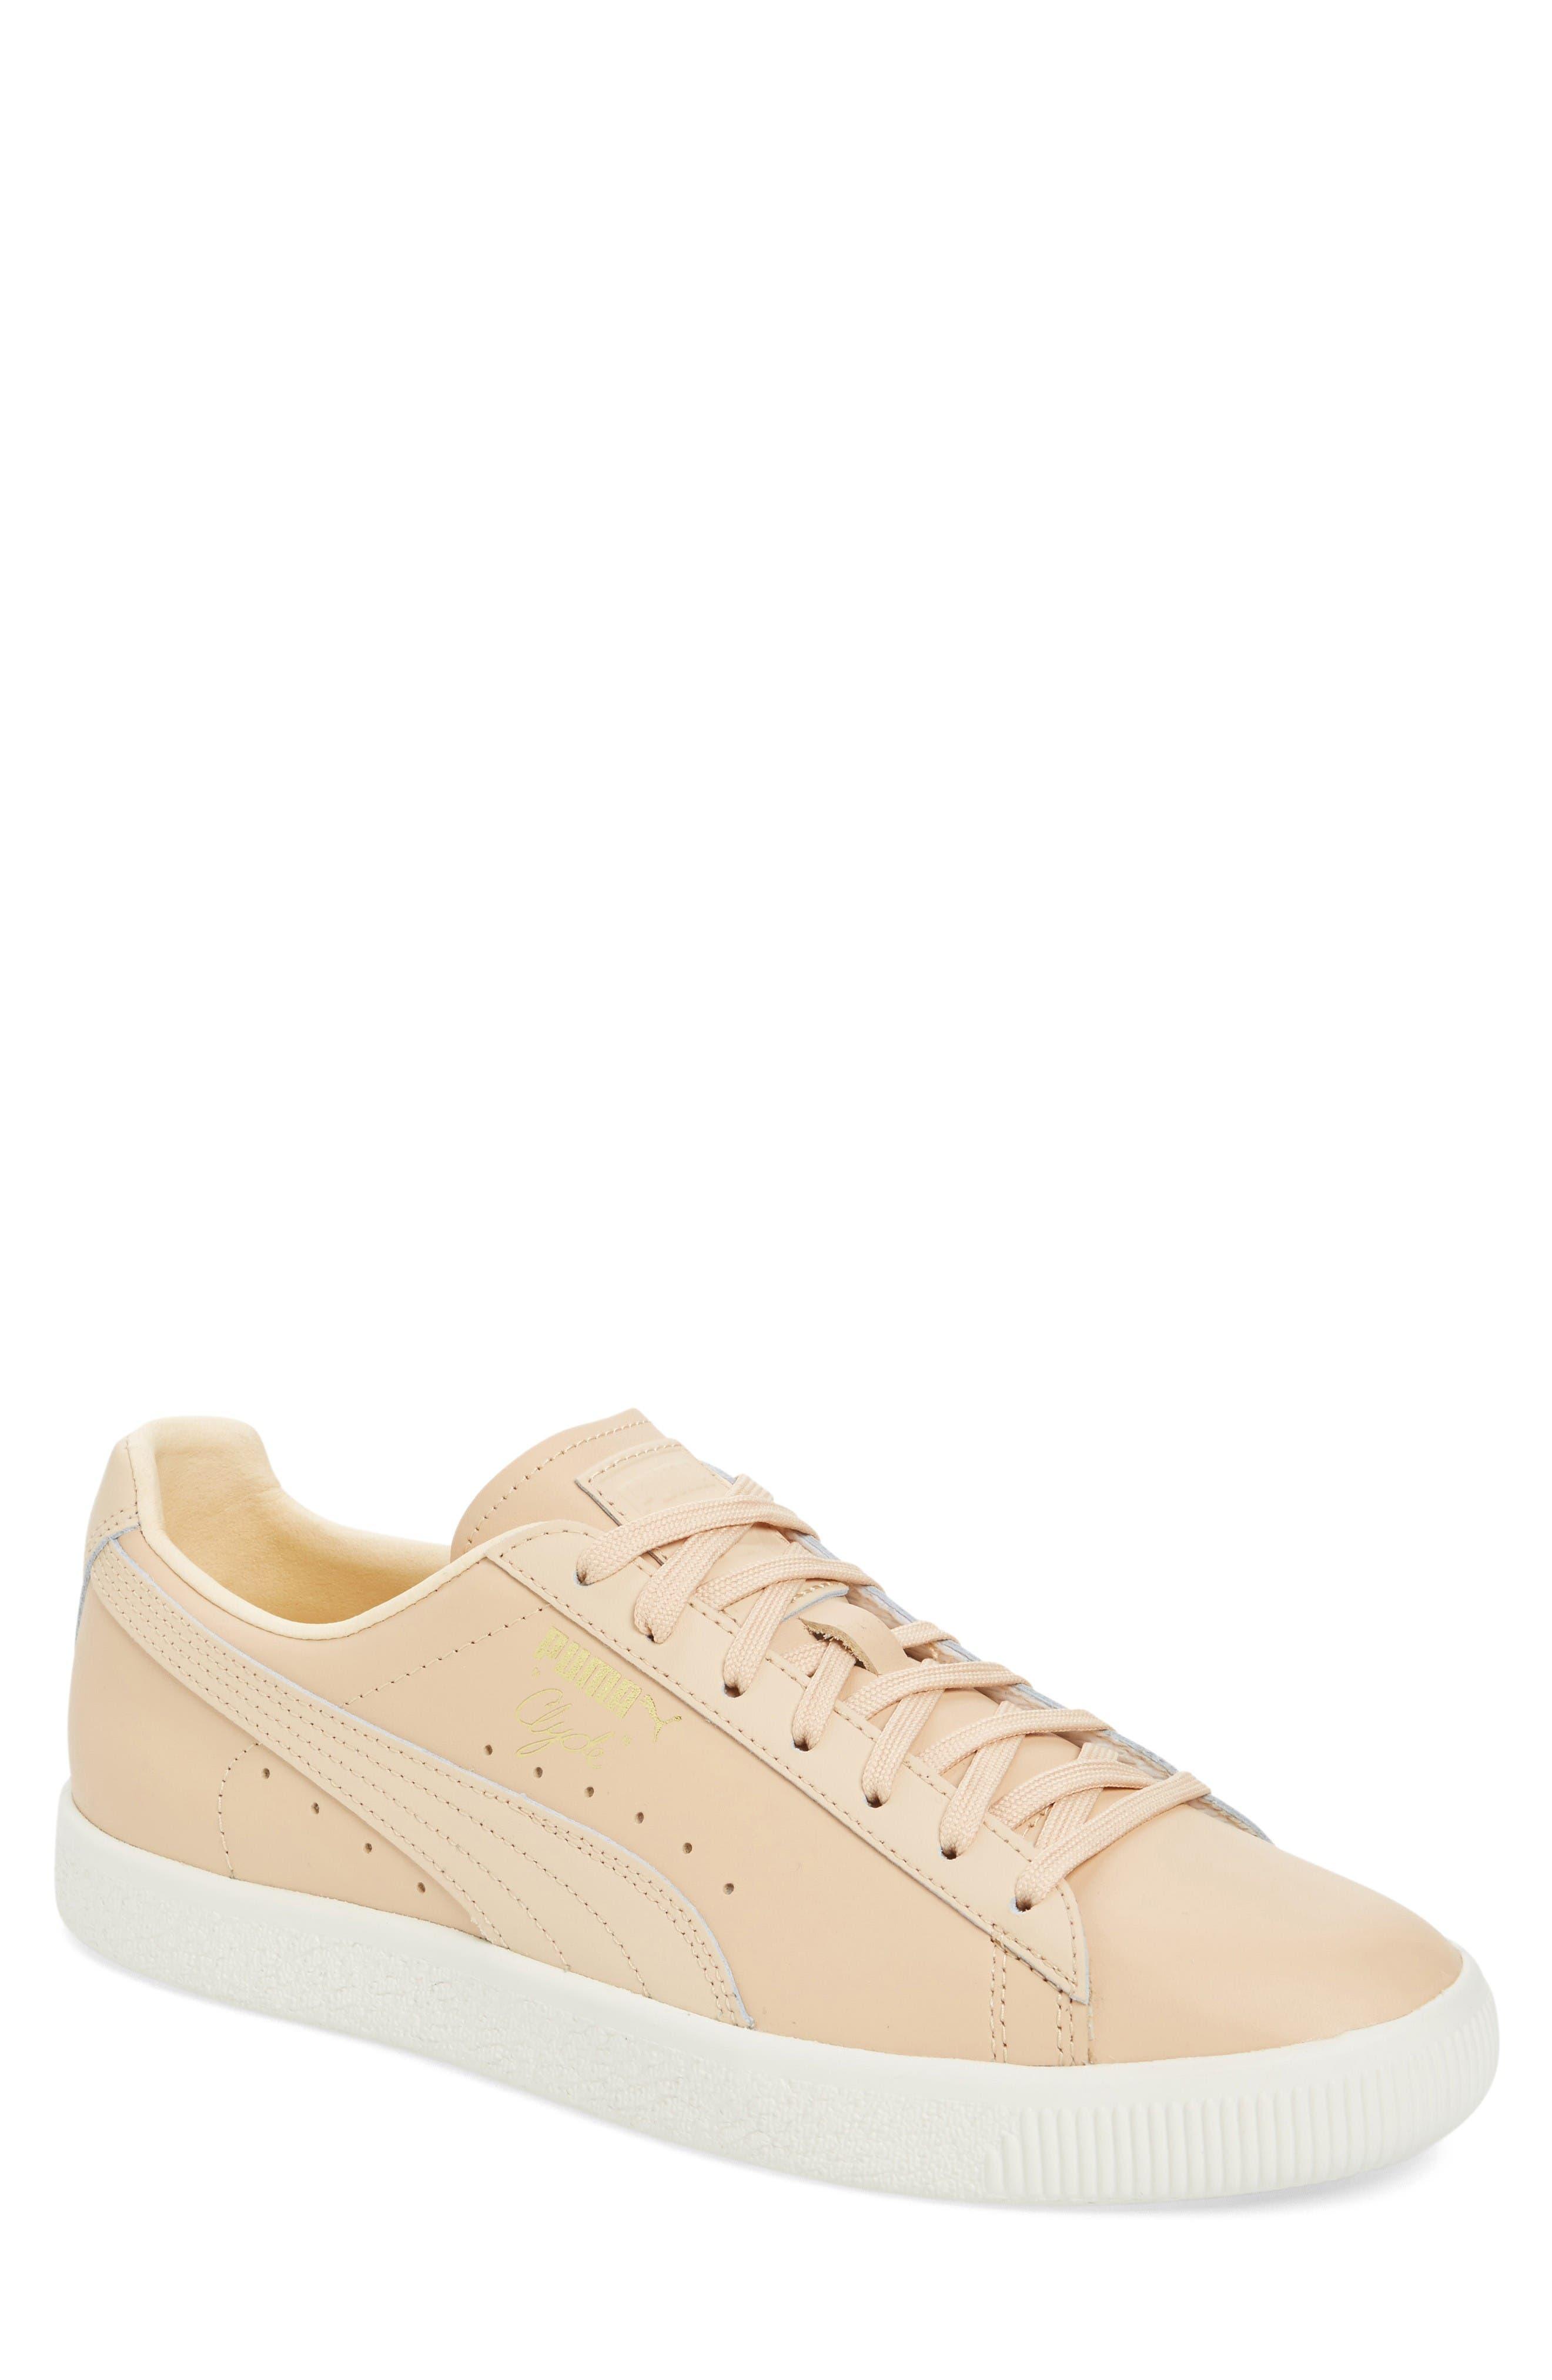 Puma Clyde Sneaker (Men)